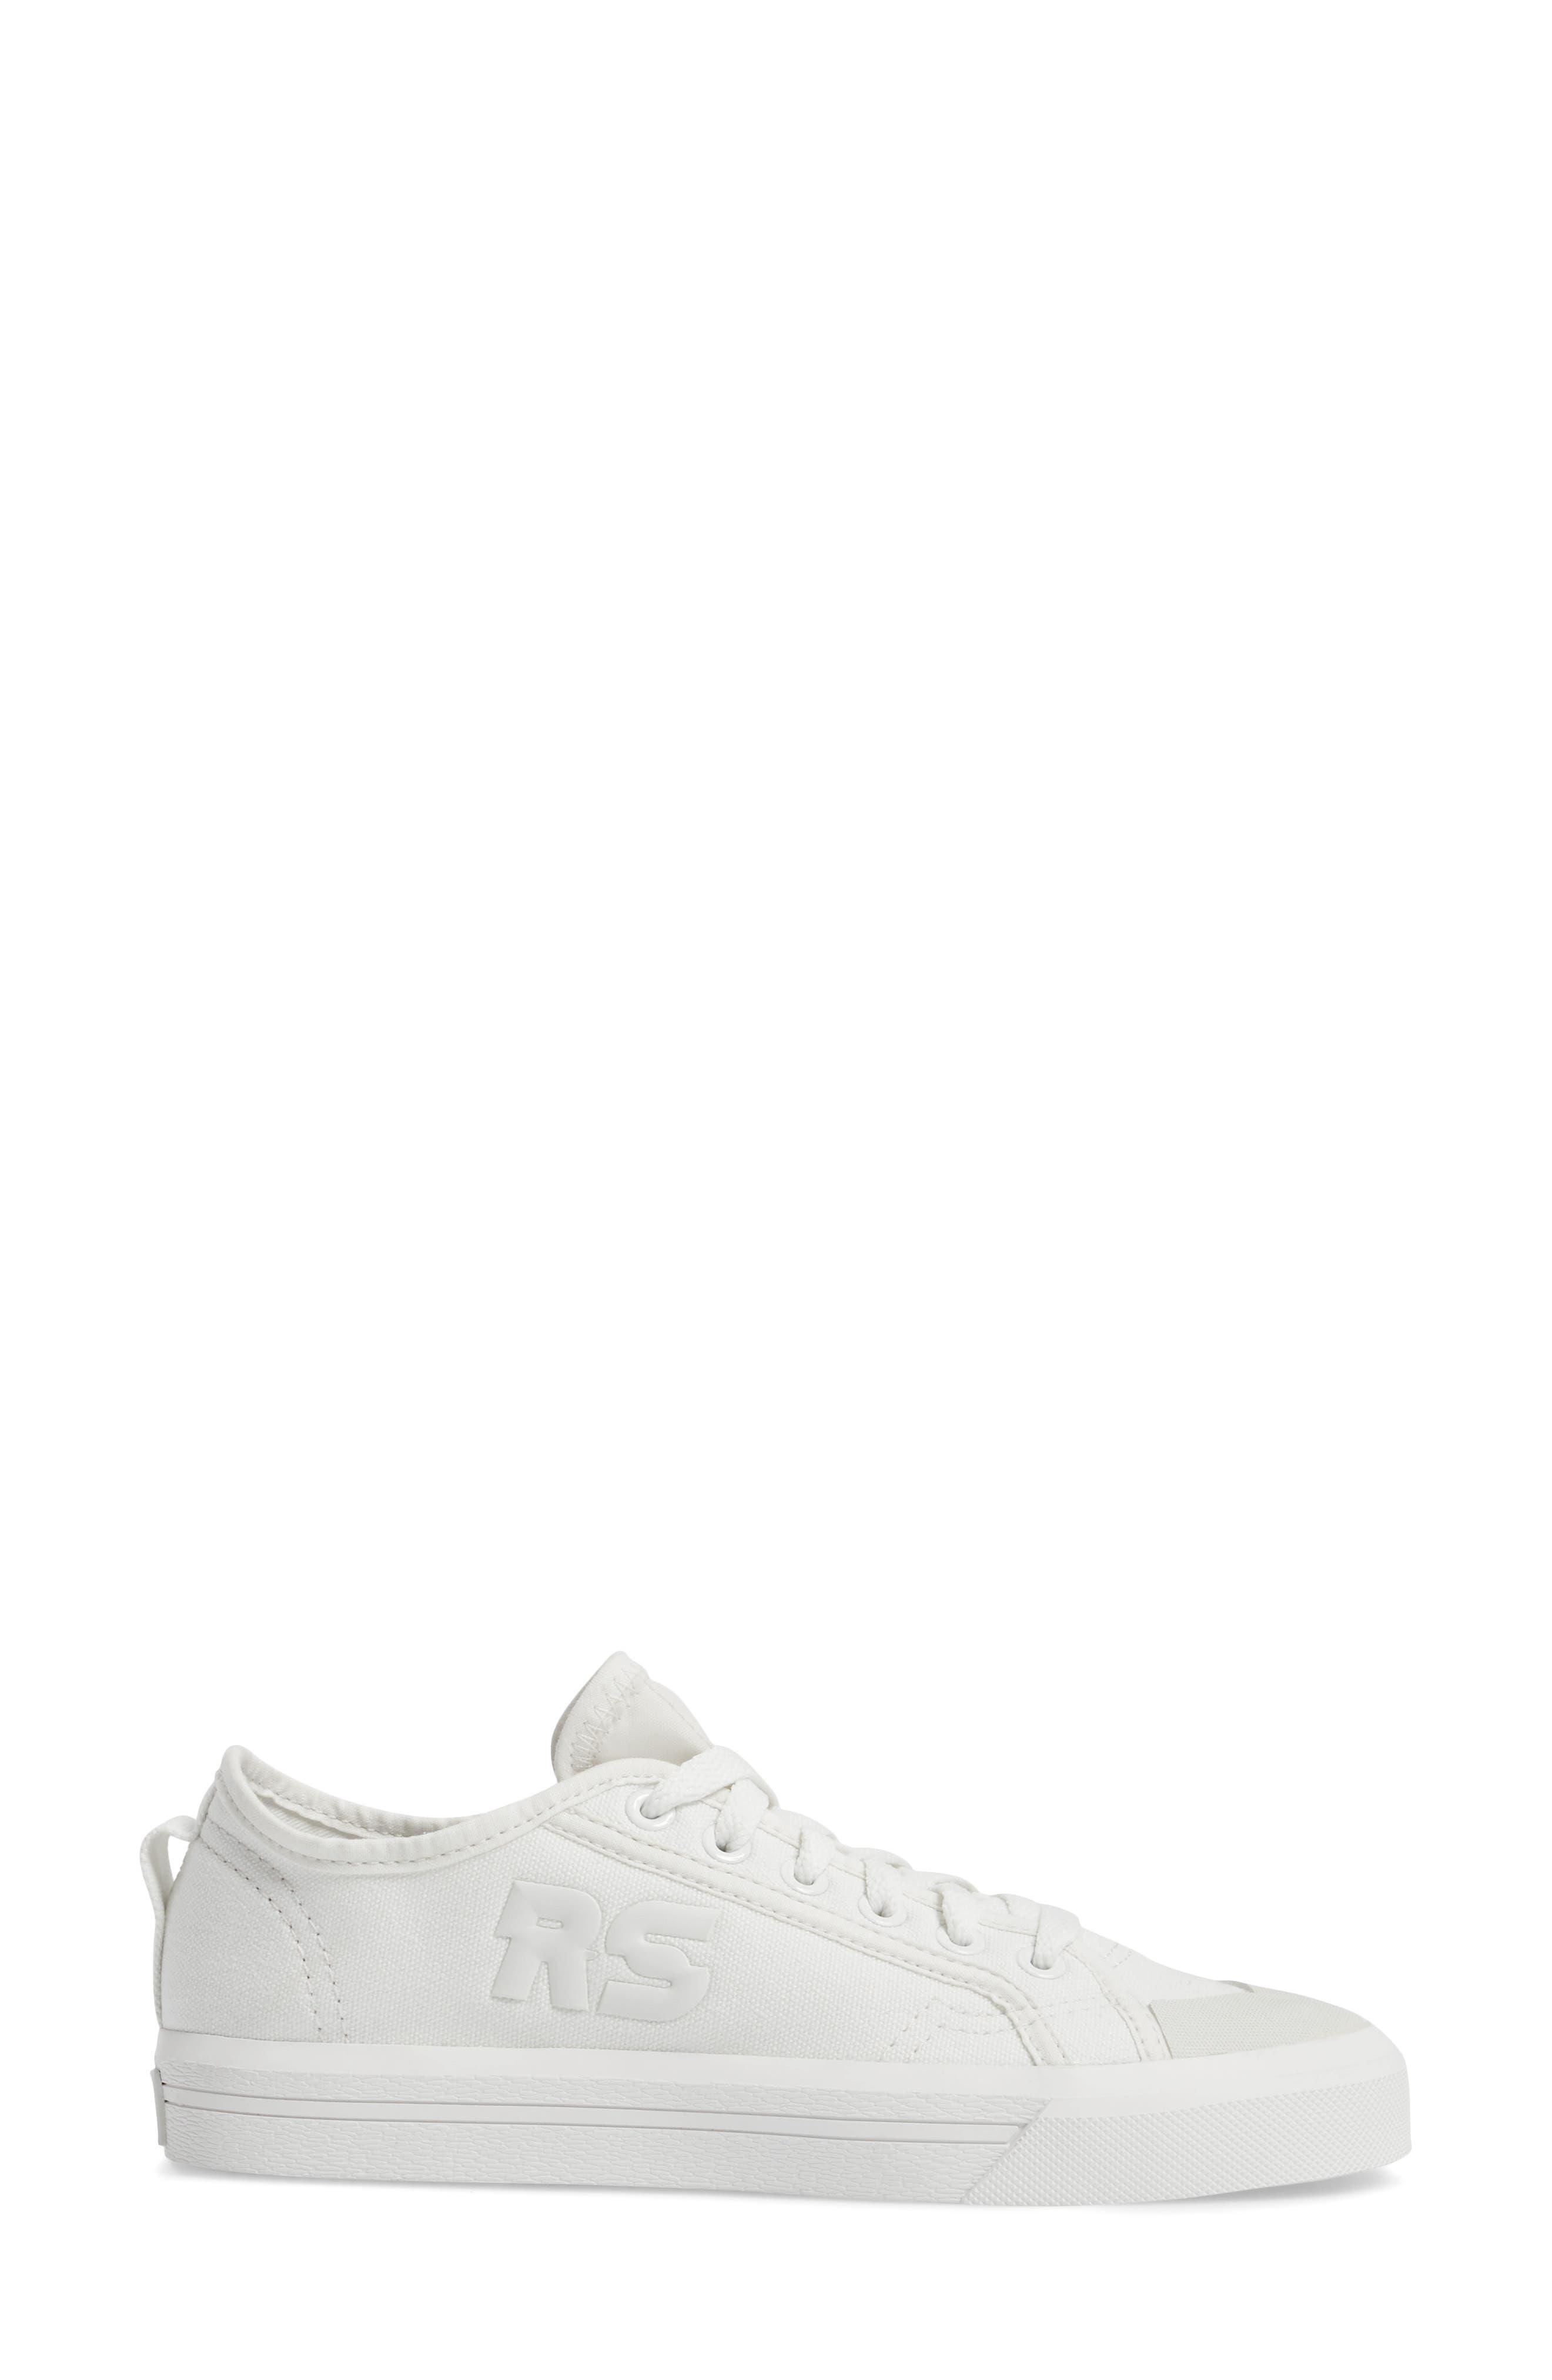 adidas by Raf Simons Spirit Low Top Sneaker,                             Alternate thumbnail 3, color,                             Optic White